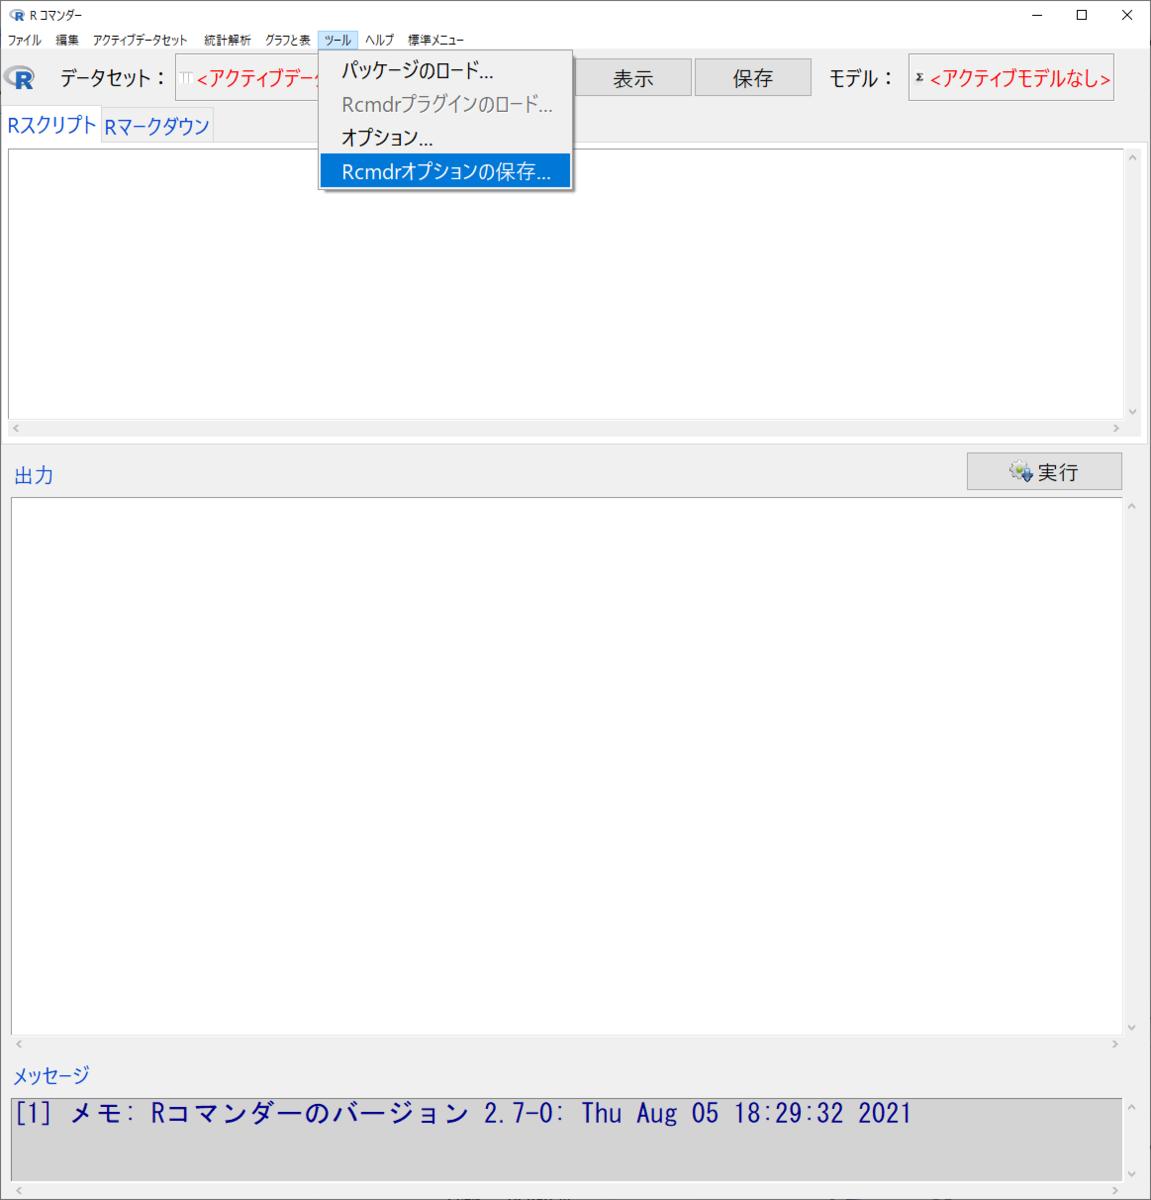 f:id:toukeier:20210805184457p:plain